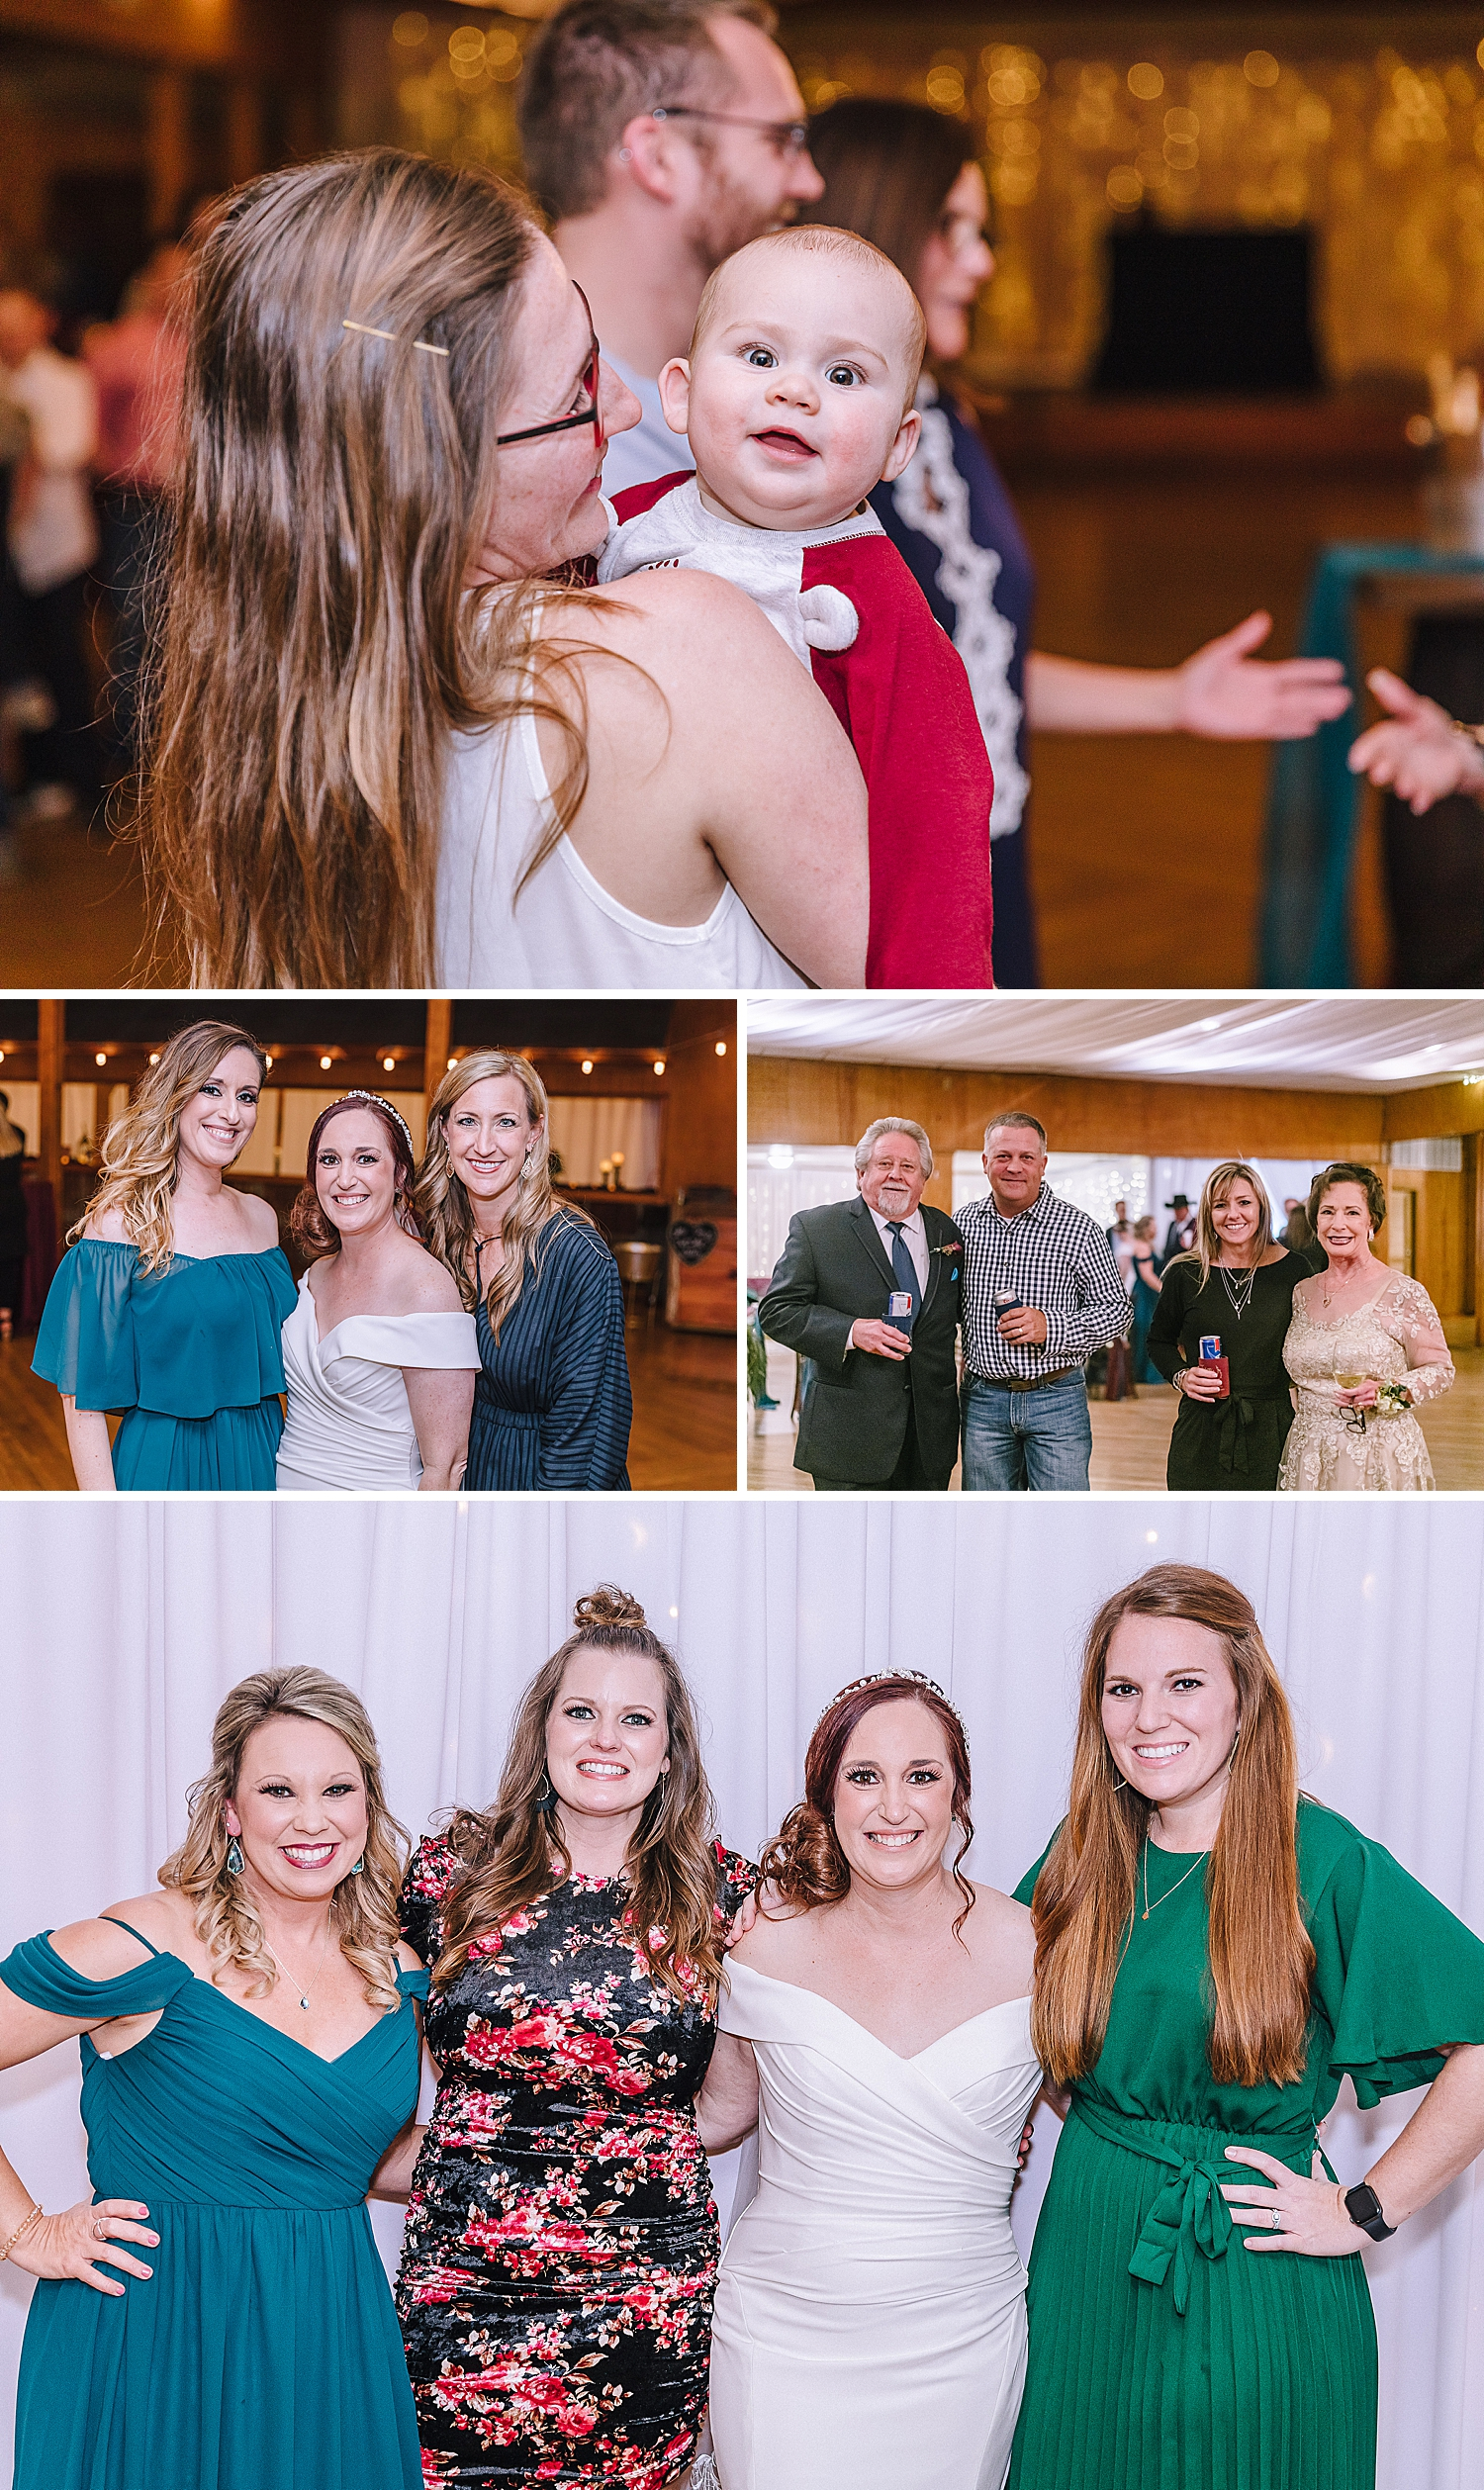 Jewel-Tone-Texas-Wedding-Valerie-Jason-Carly-Barton-Photography_0072.jpg